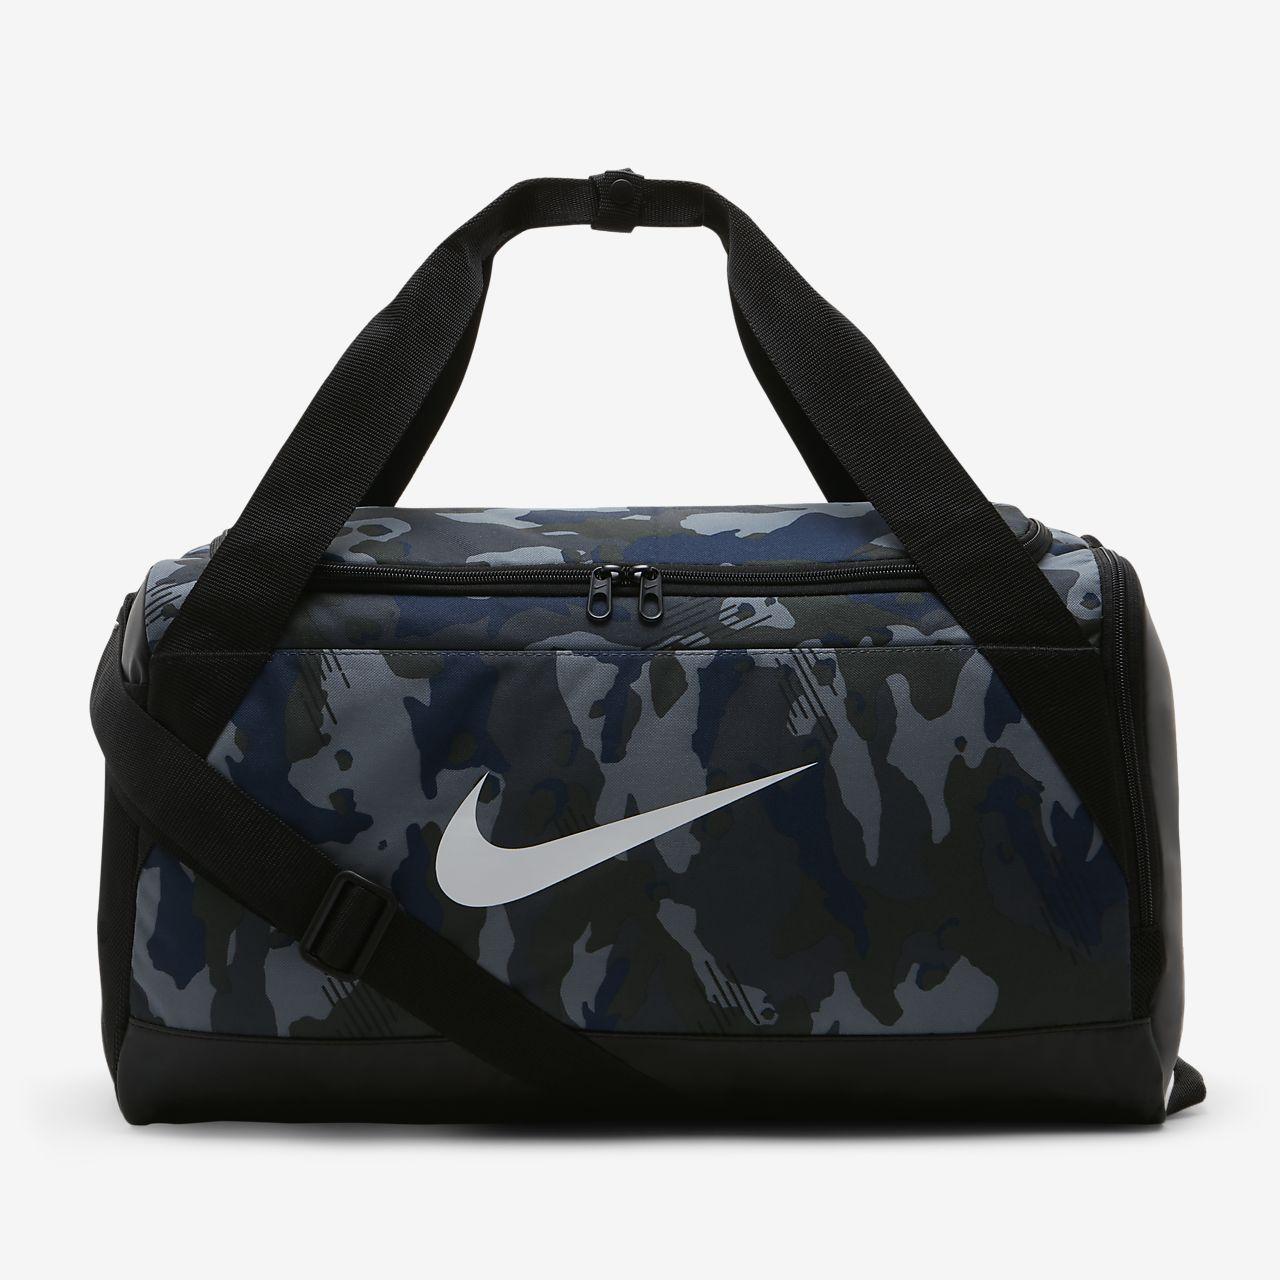 f95824effe9e Nike Brasilia (Small) Graphic Training Duffel Bag. Nike.com IE